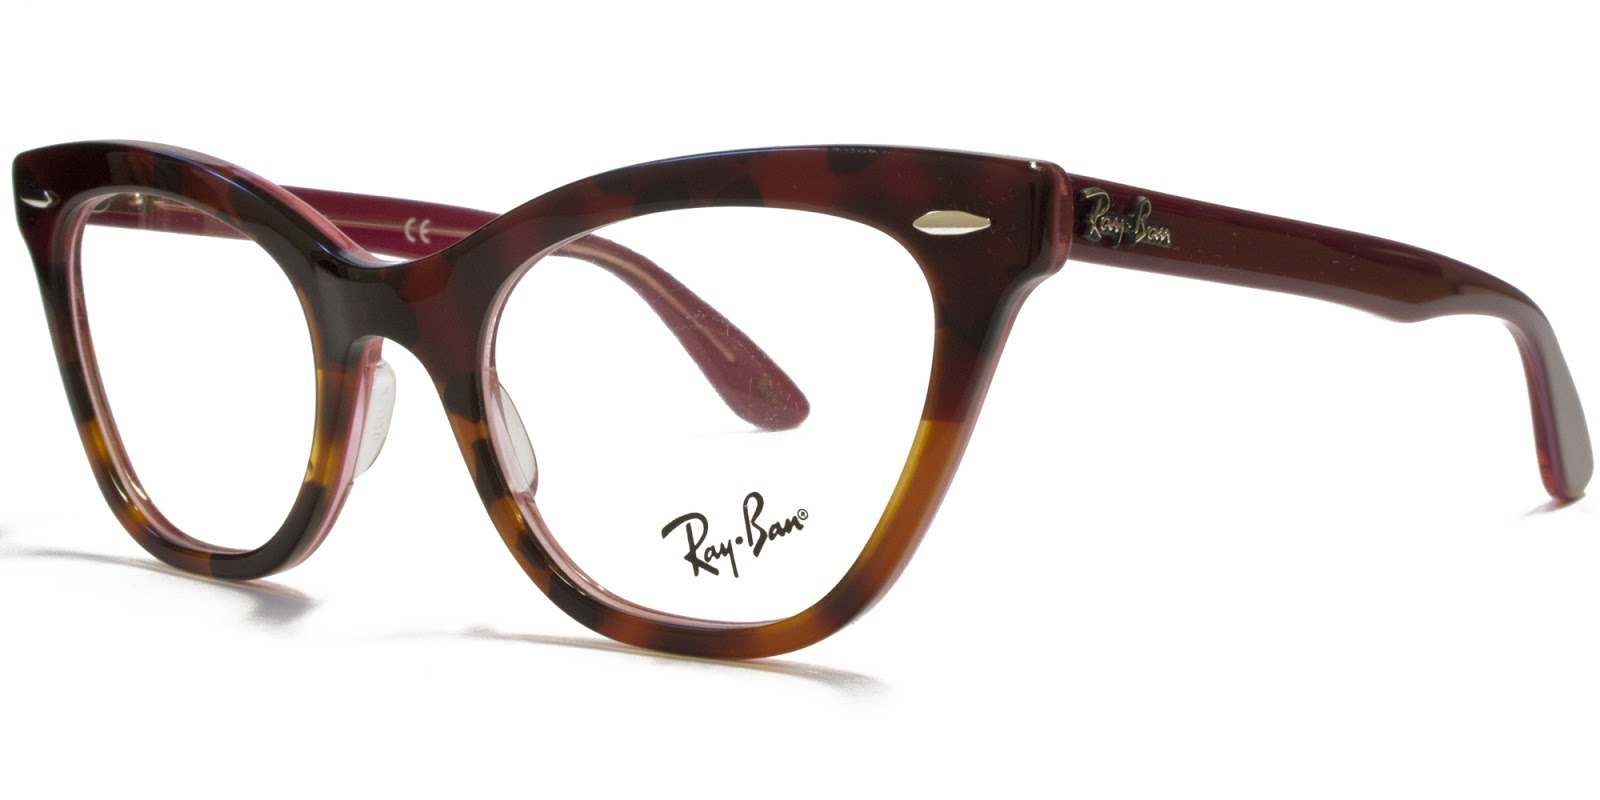 a97b906463f Cat Eye Ray Ban Eyeglasses « One More Soul